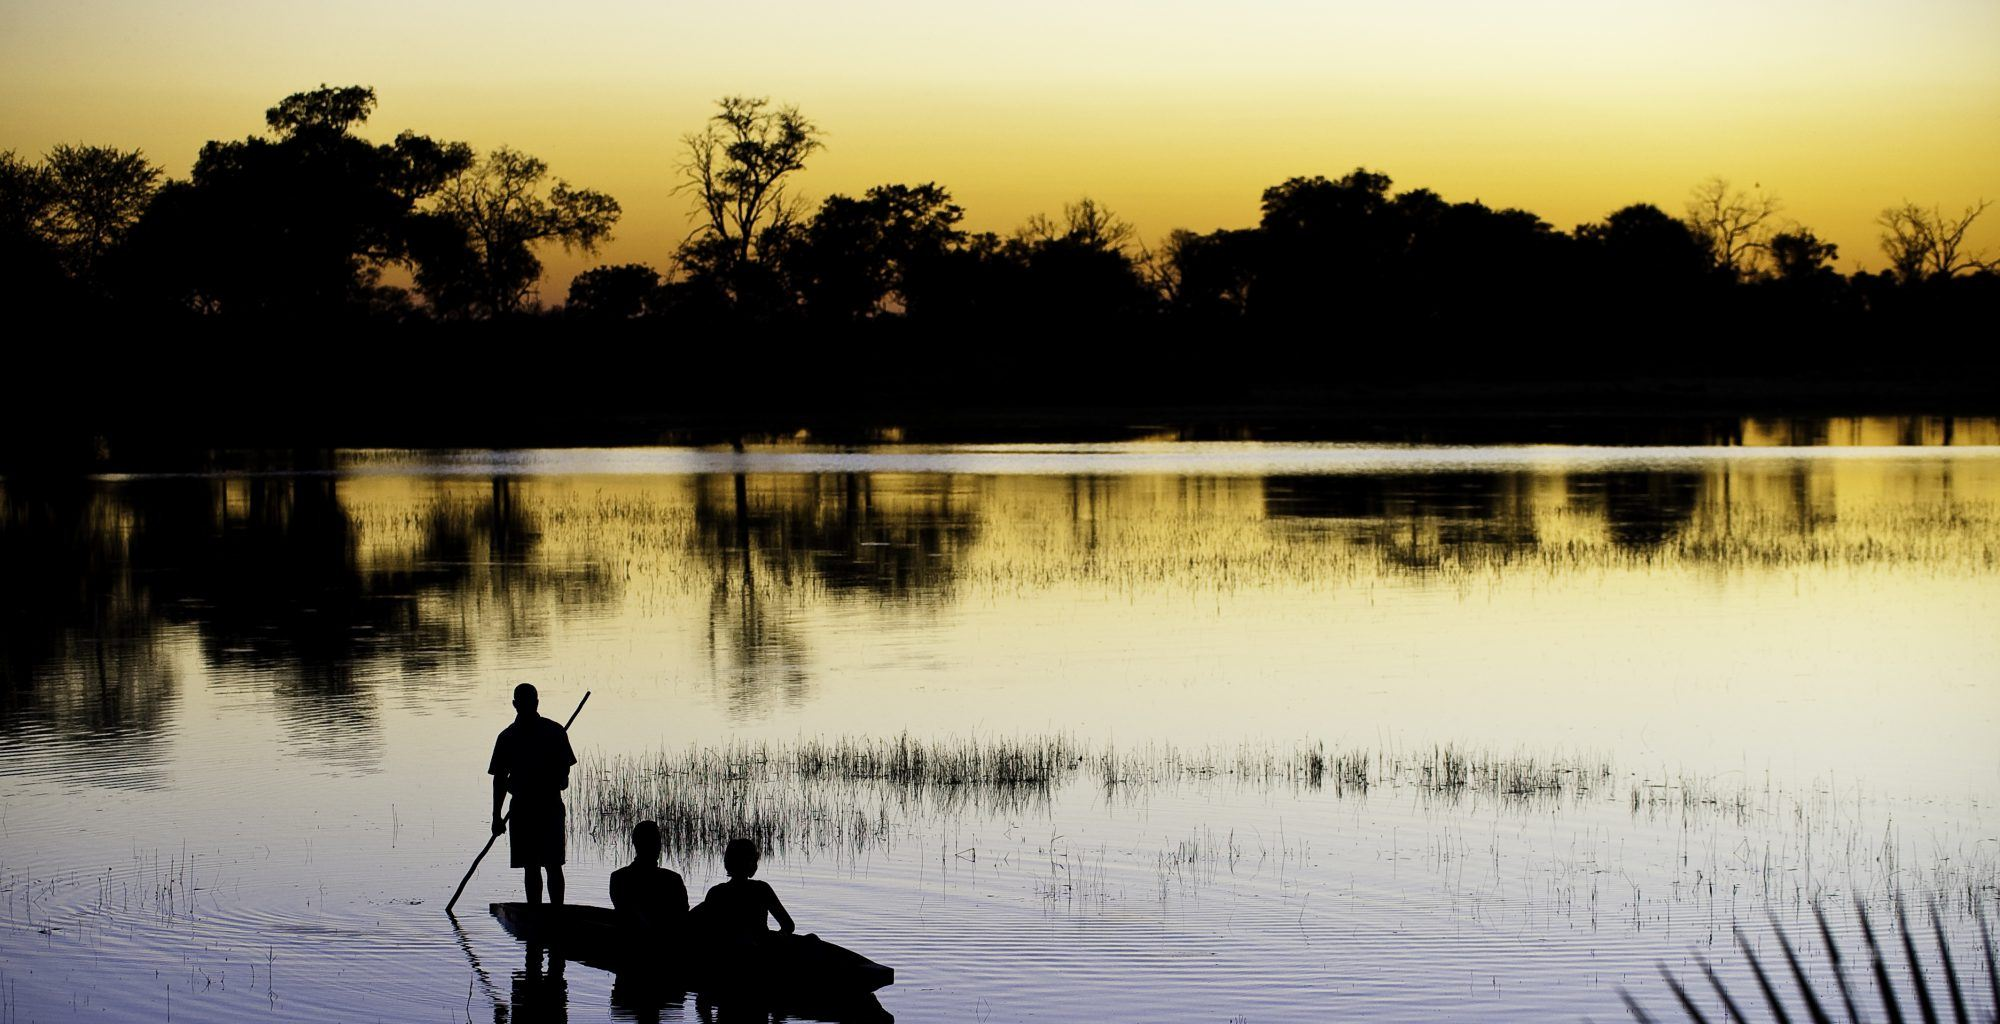 Botswana-Moremi-Reserve-Rowing-Sunset